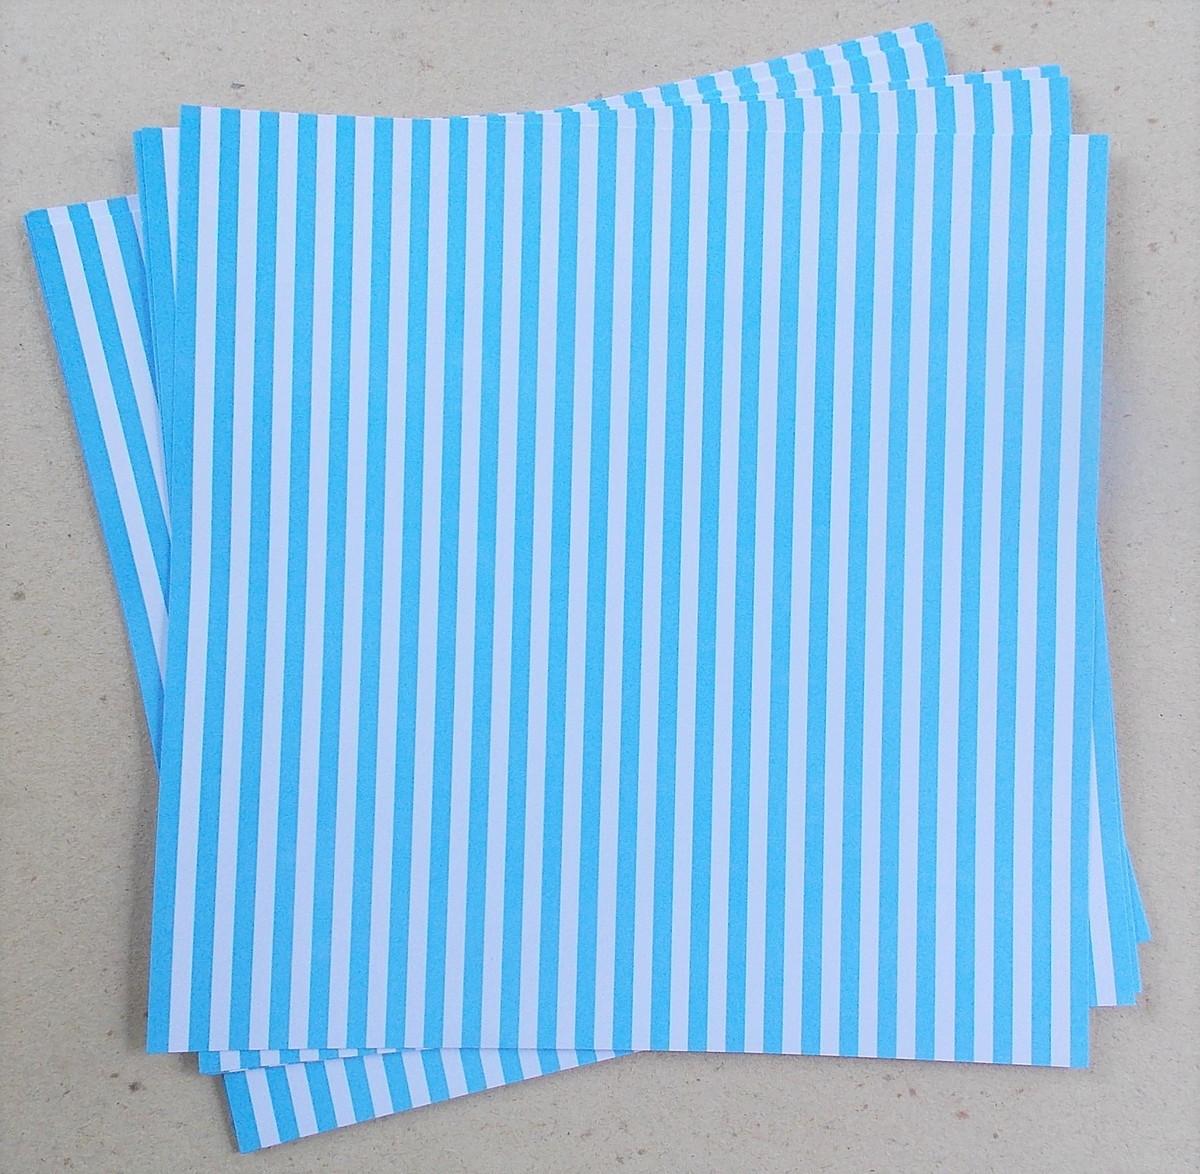 Papel scrapbook azul claro torre d 39 papel elo7 for Papel decorativo azul